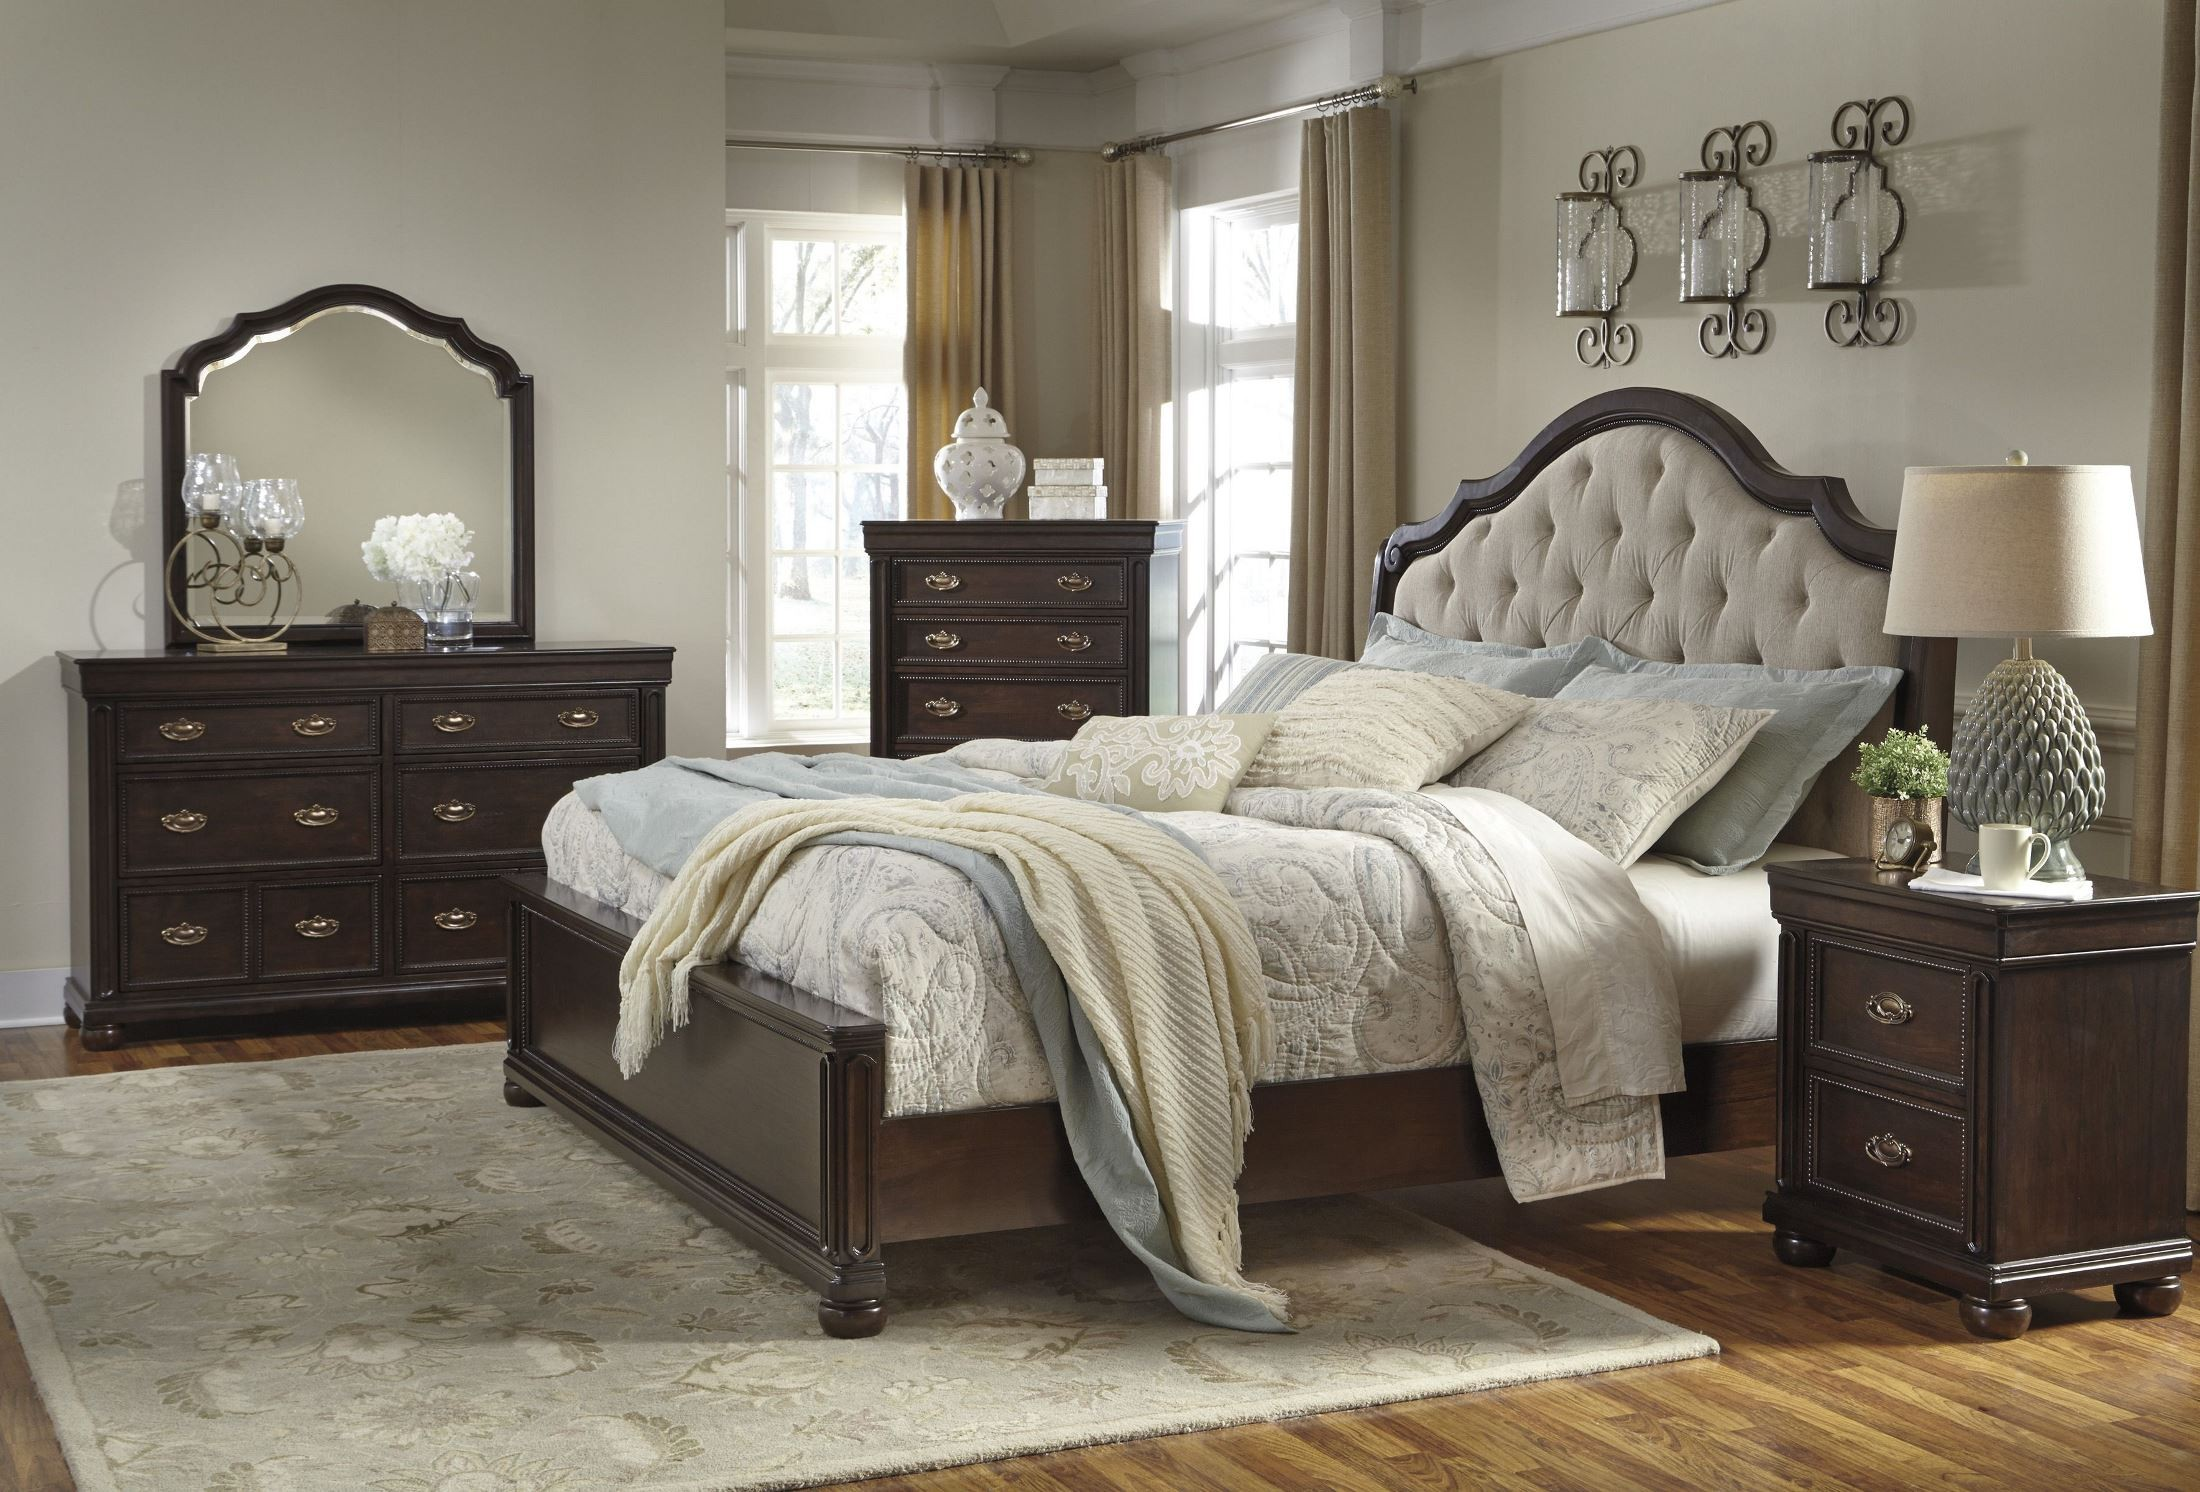 Moluxy Dark Brown King Upholstered Sleigh Bed B596 56 58 97 Ashley